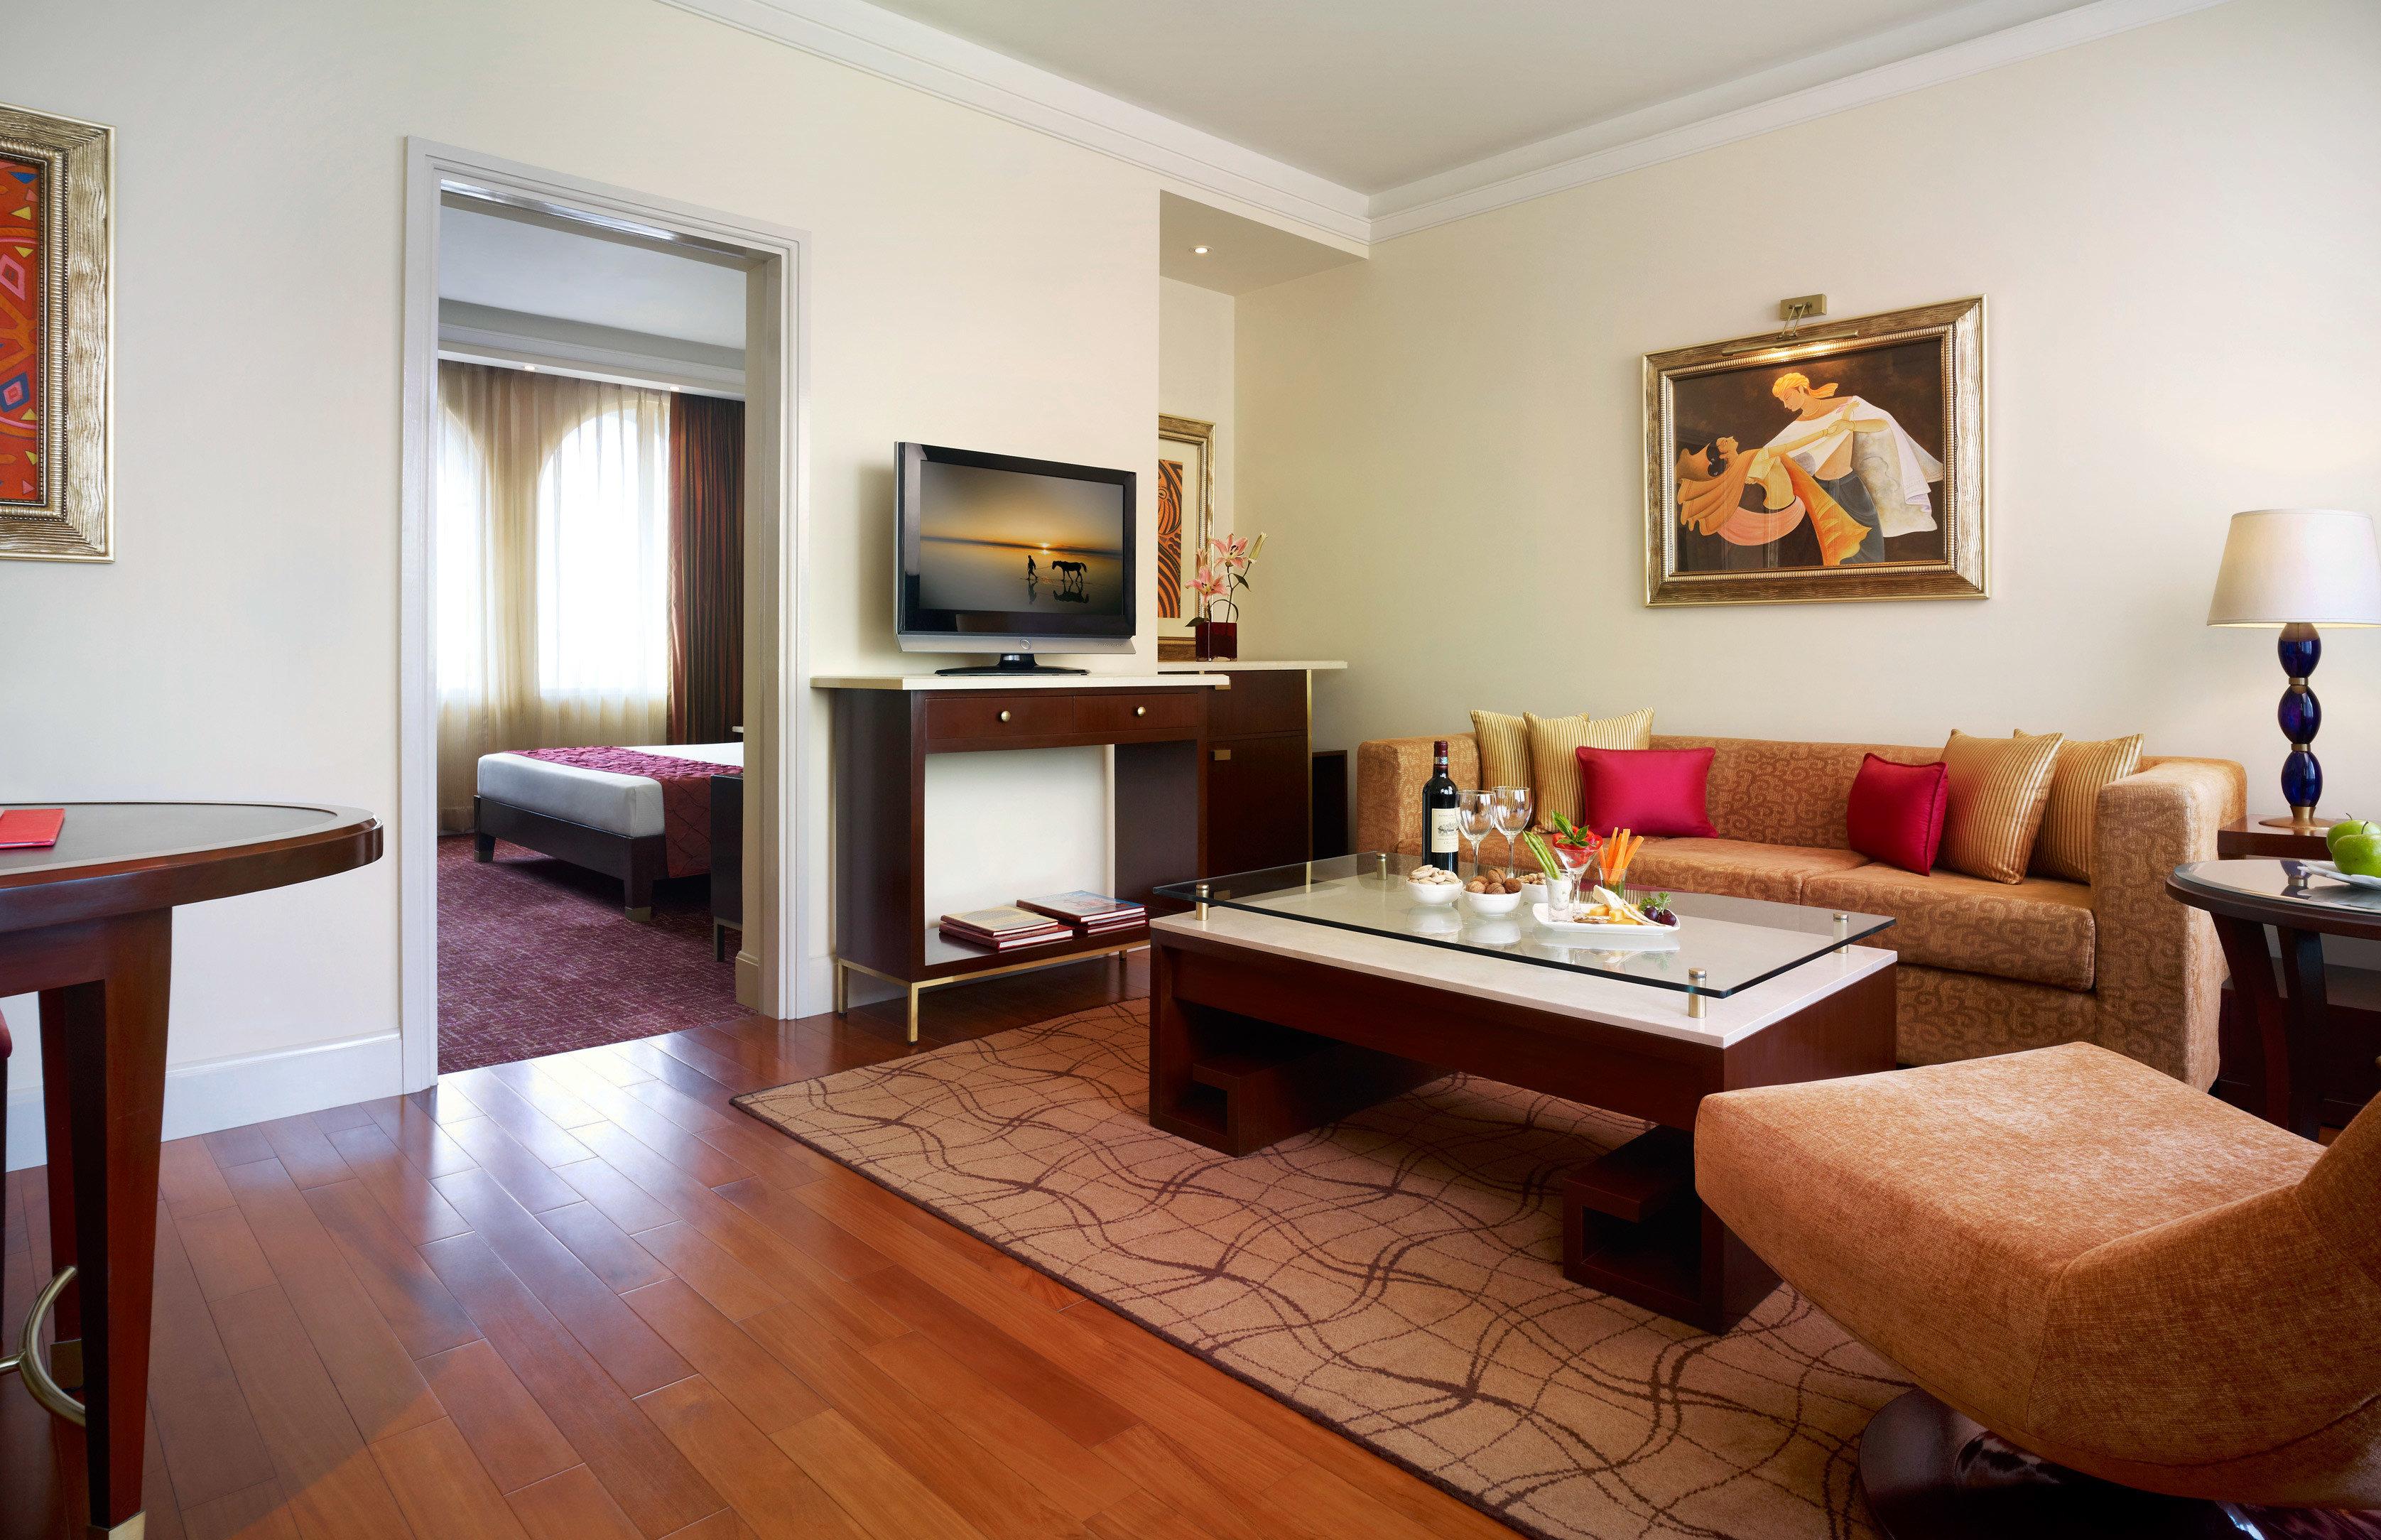 Bedroom Classic Suite property living room home hardwood cottage wood flooring Villa condominium laminate flooring